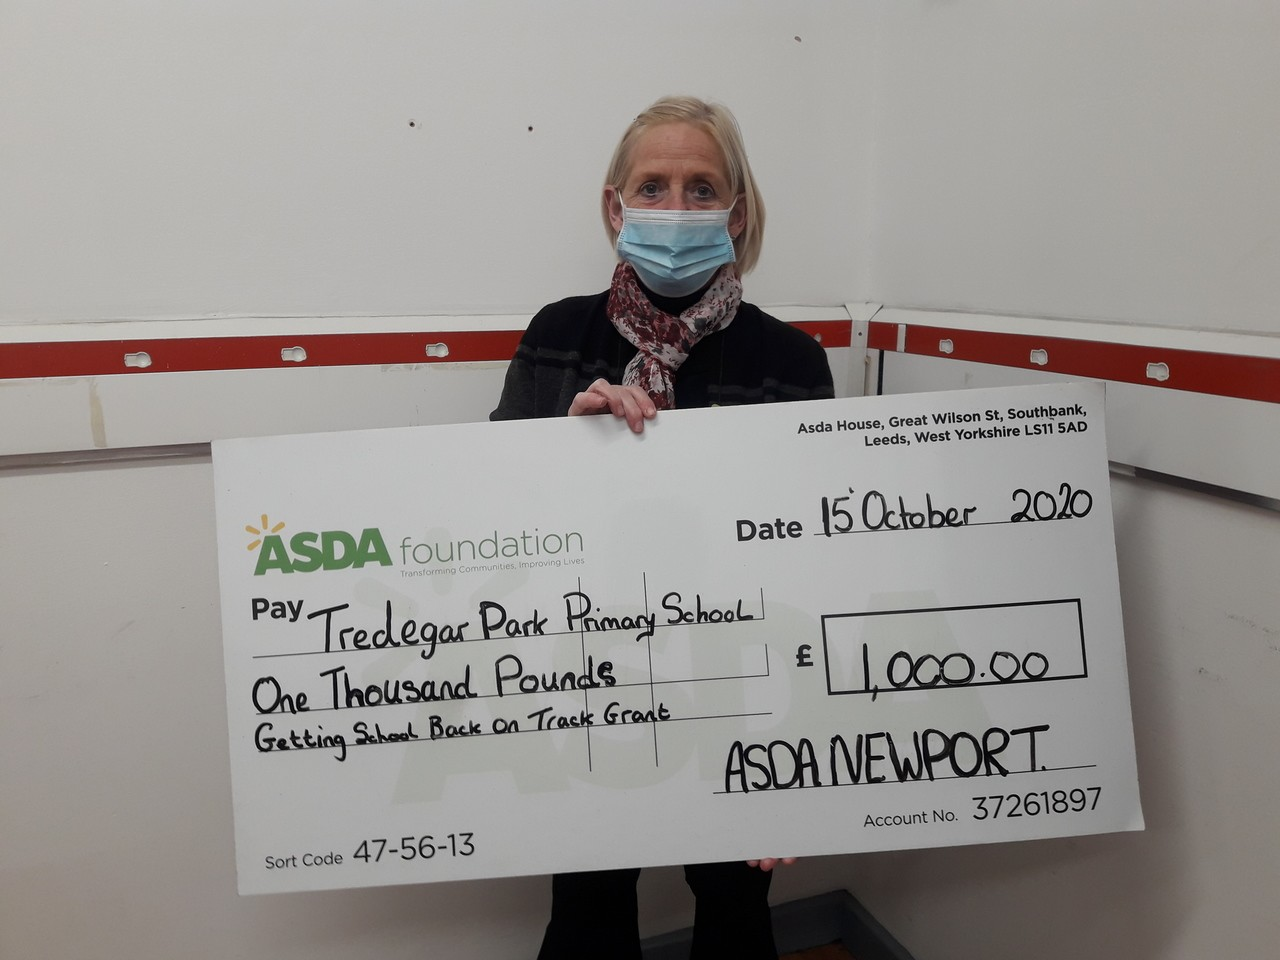 £1,000 for primary school | Asda Newport